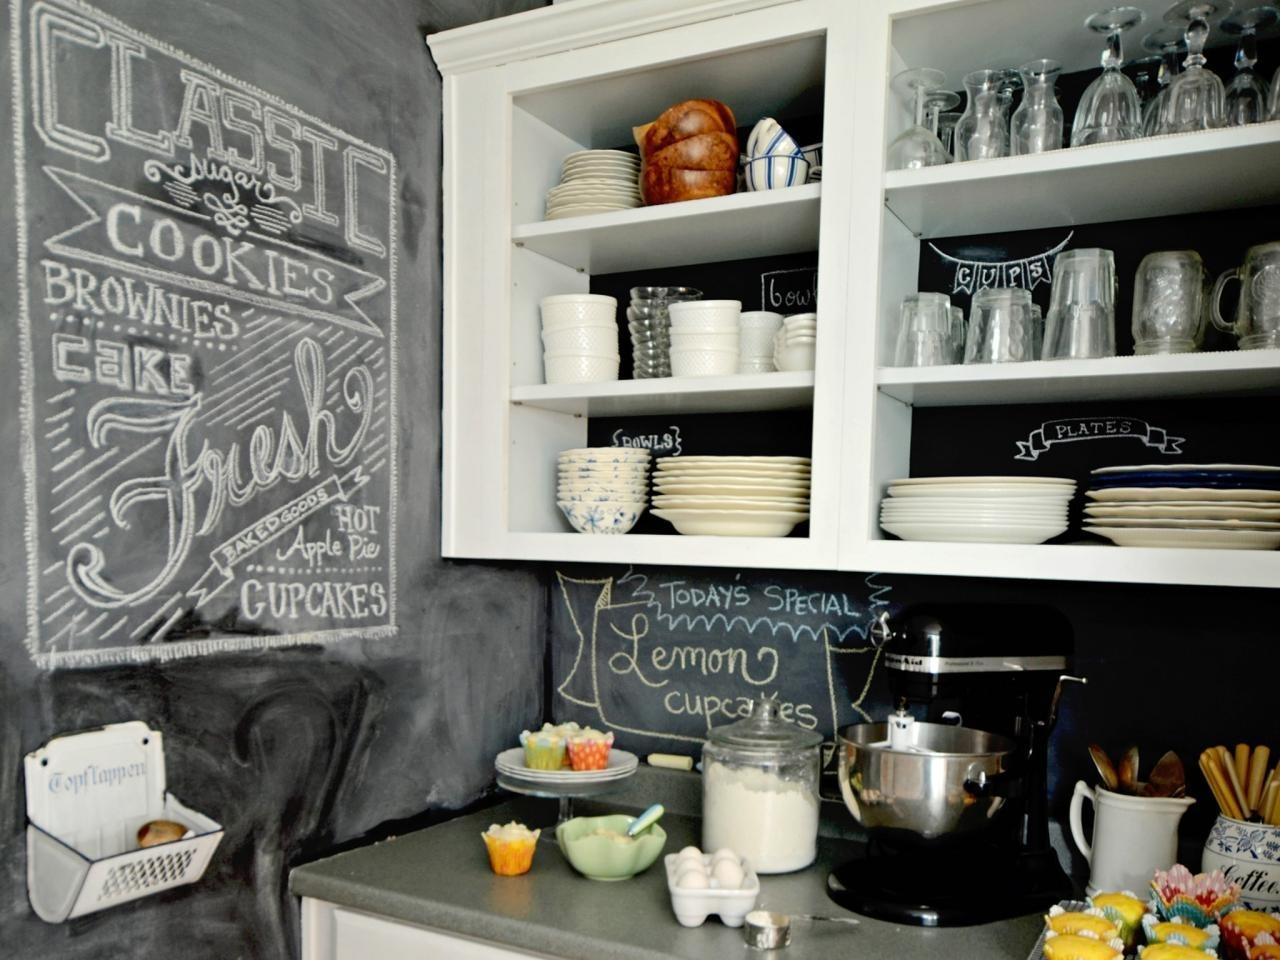 10 Stunning Backsplash Ideas For Kitchens Inexpensive %name 2021